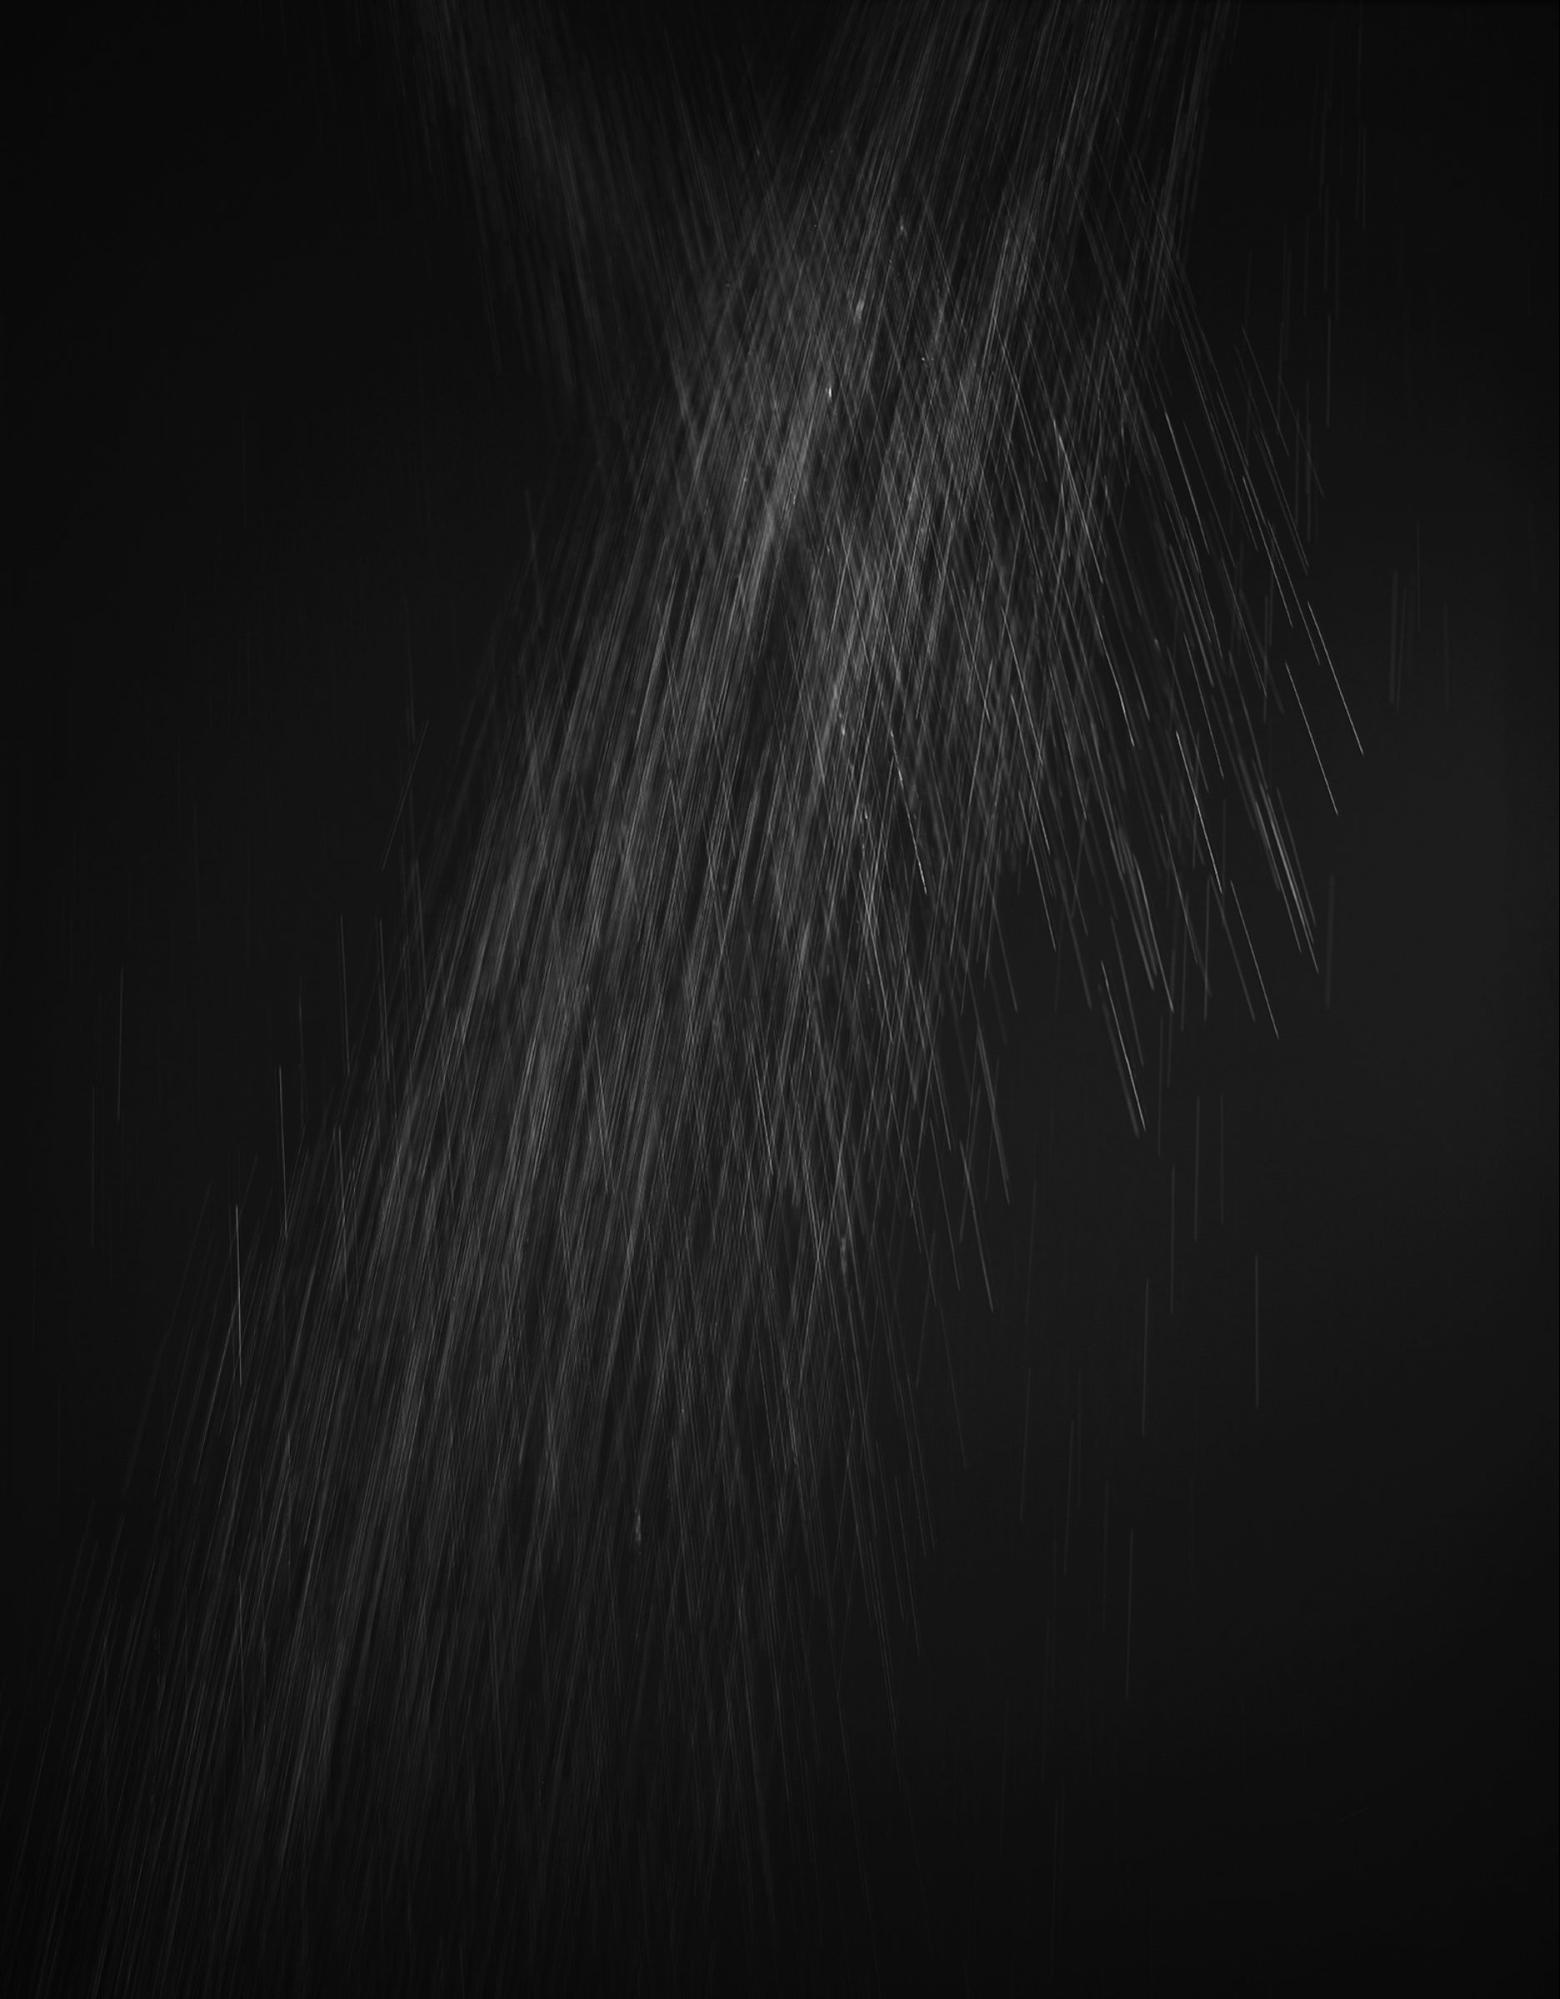 Untitled I, London, 2017 photograph by Nadav Kander